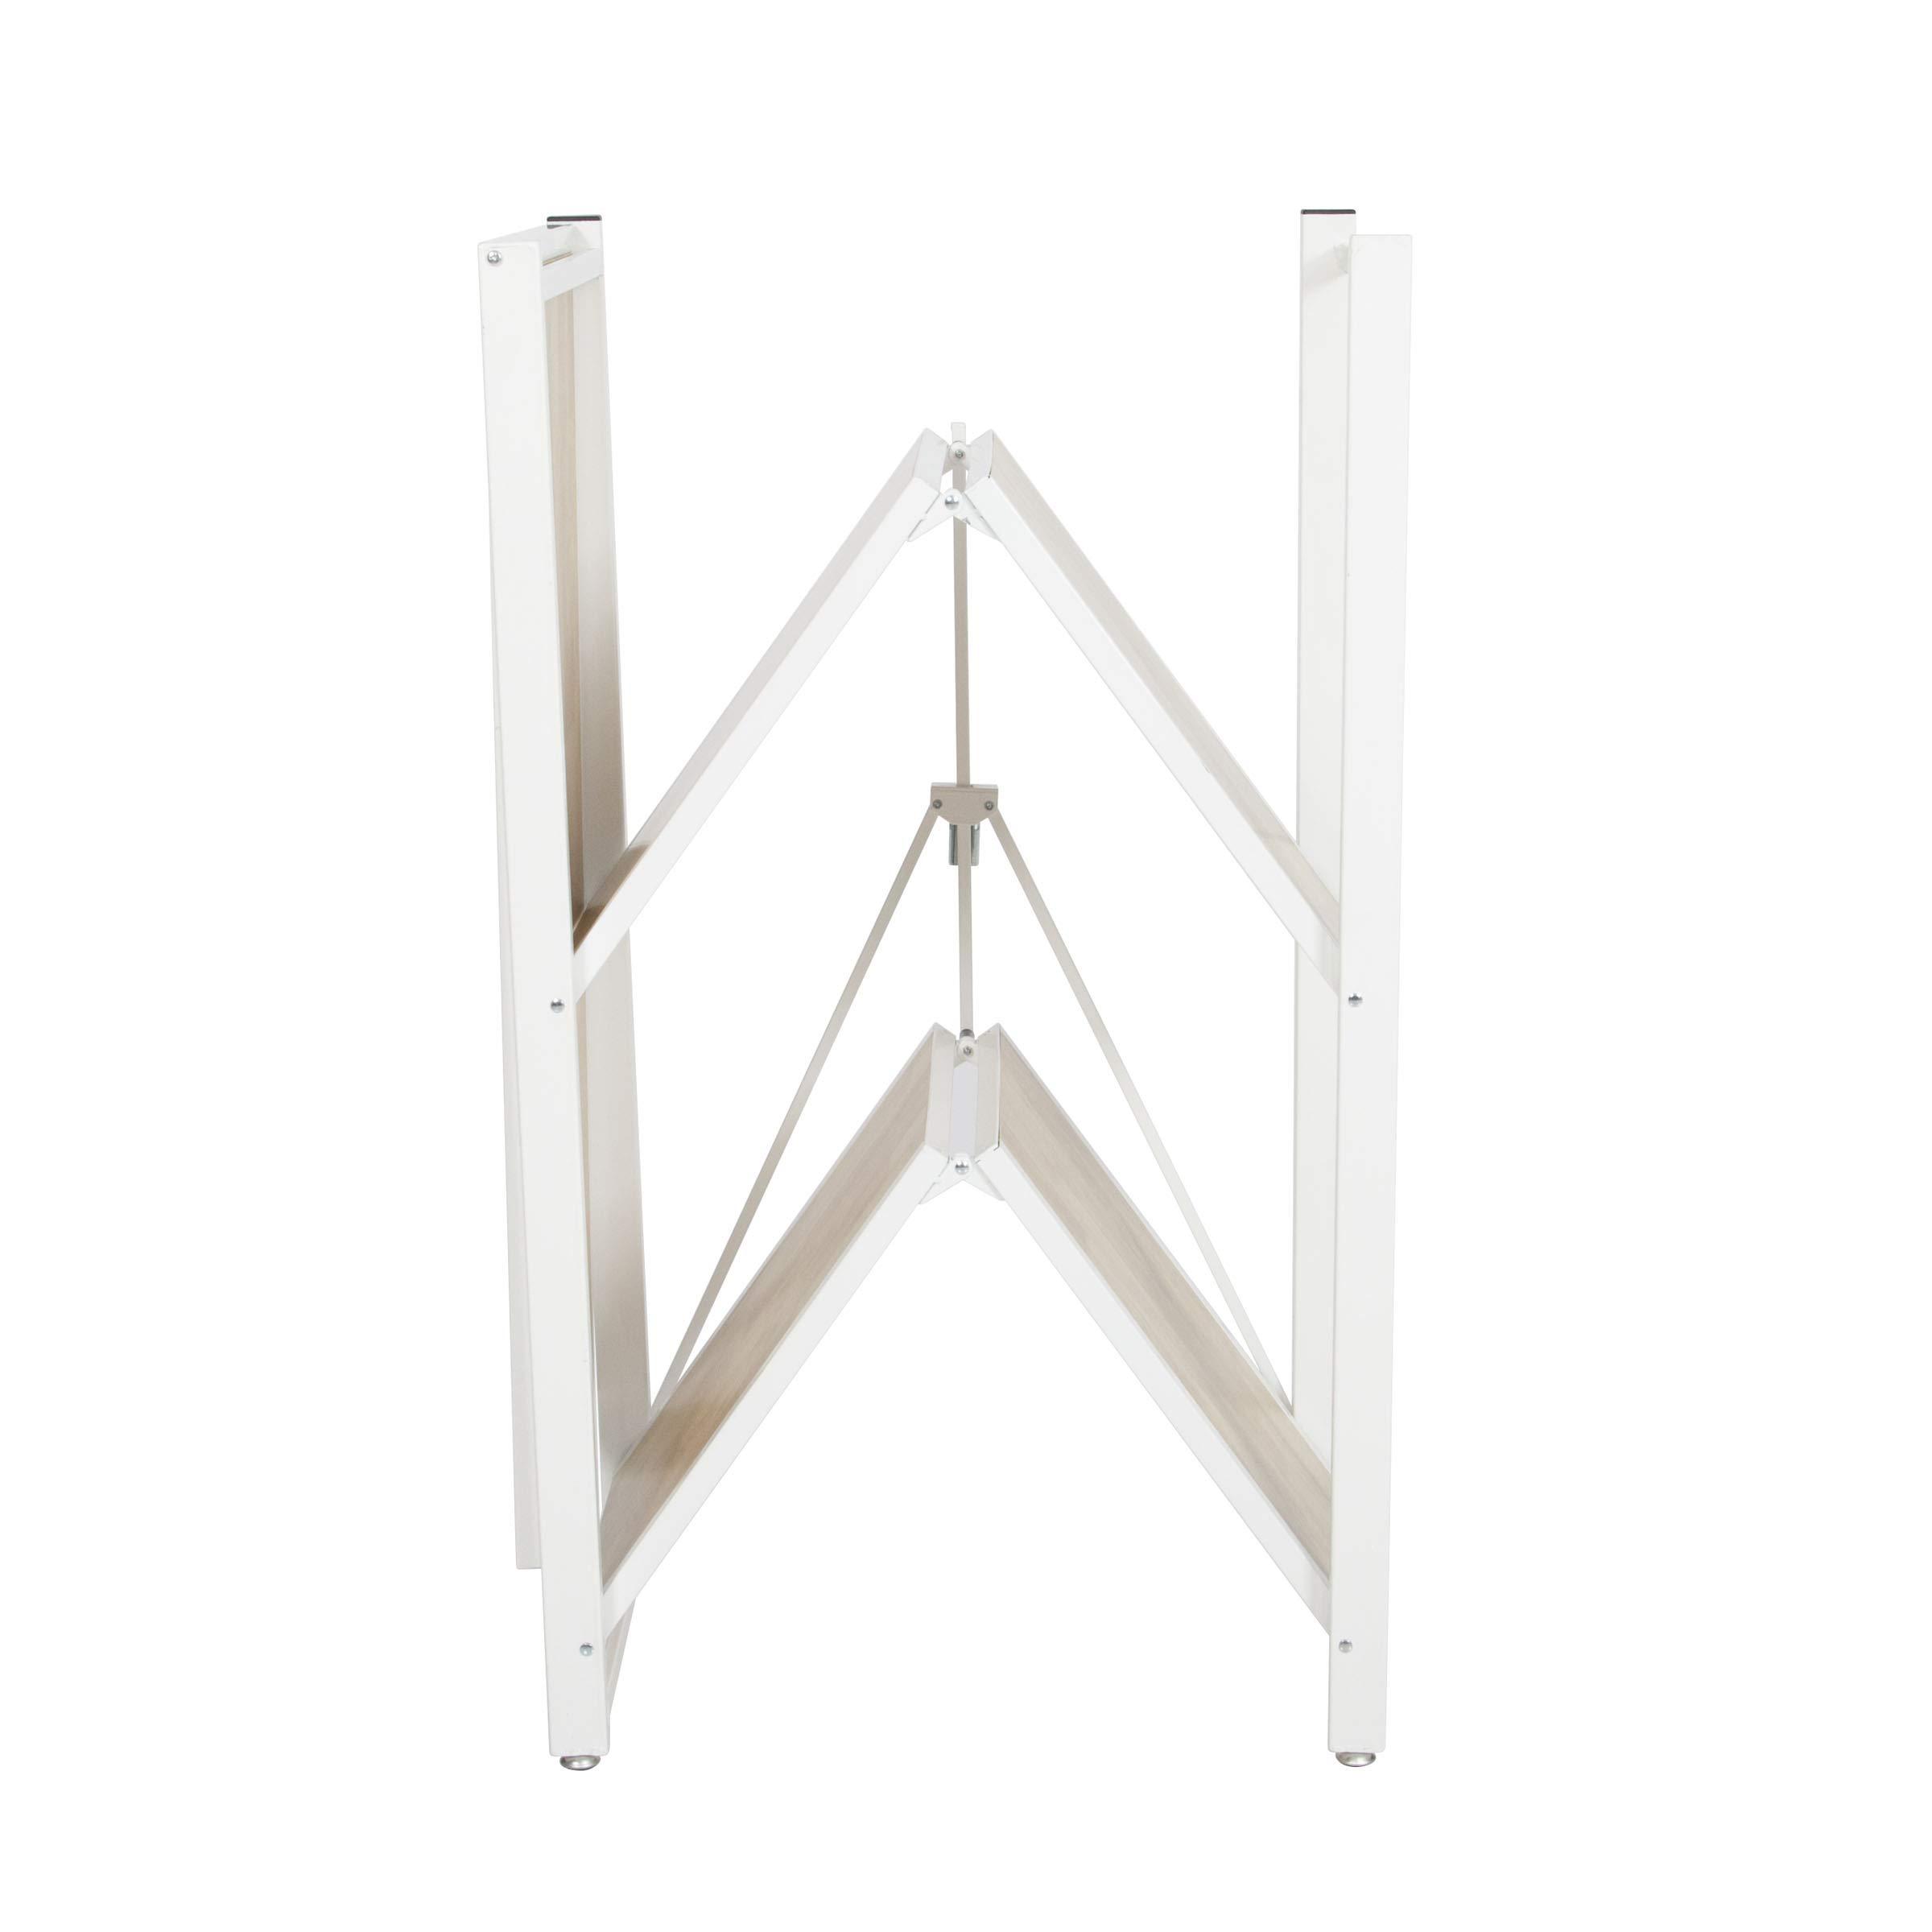 Origami Folding 4-Tier Heavy Duty Steel Baker's Rack with Wood Shelf, White by Origami (Image #8)